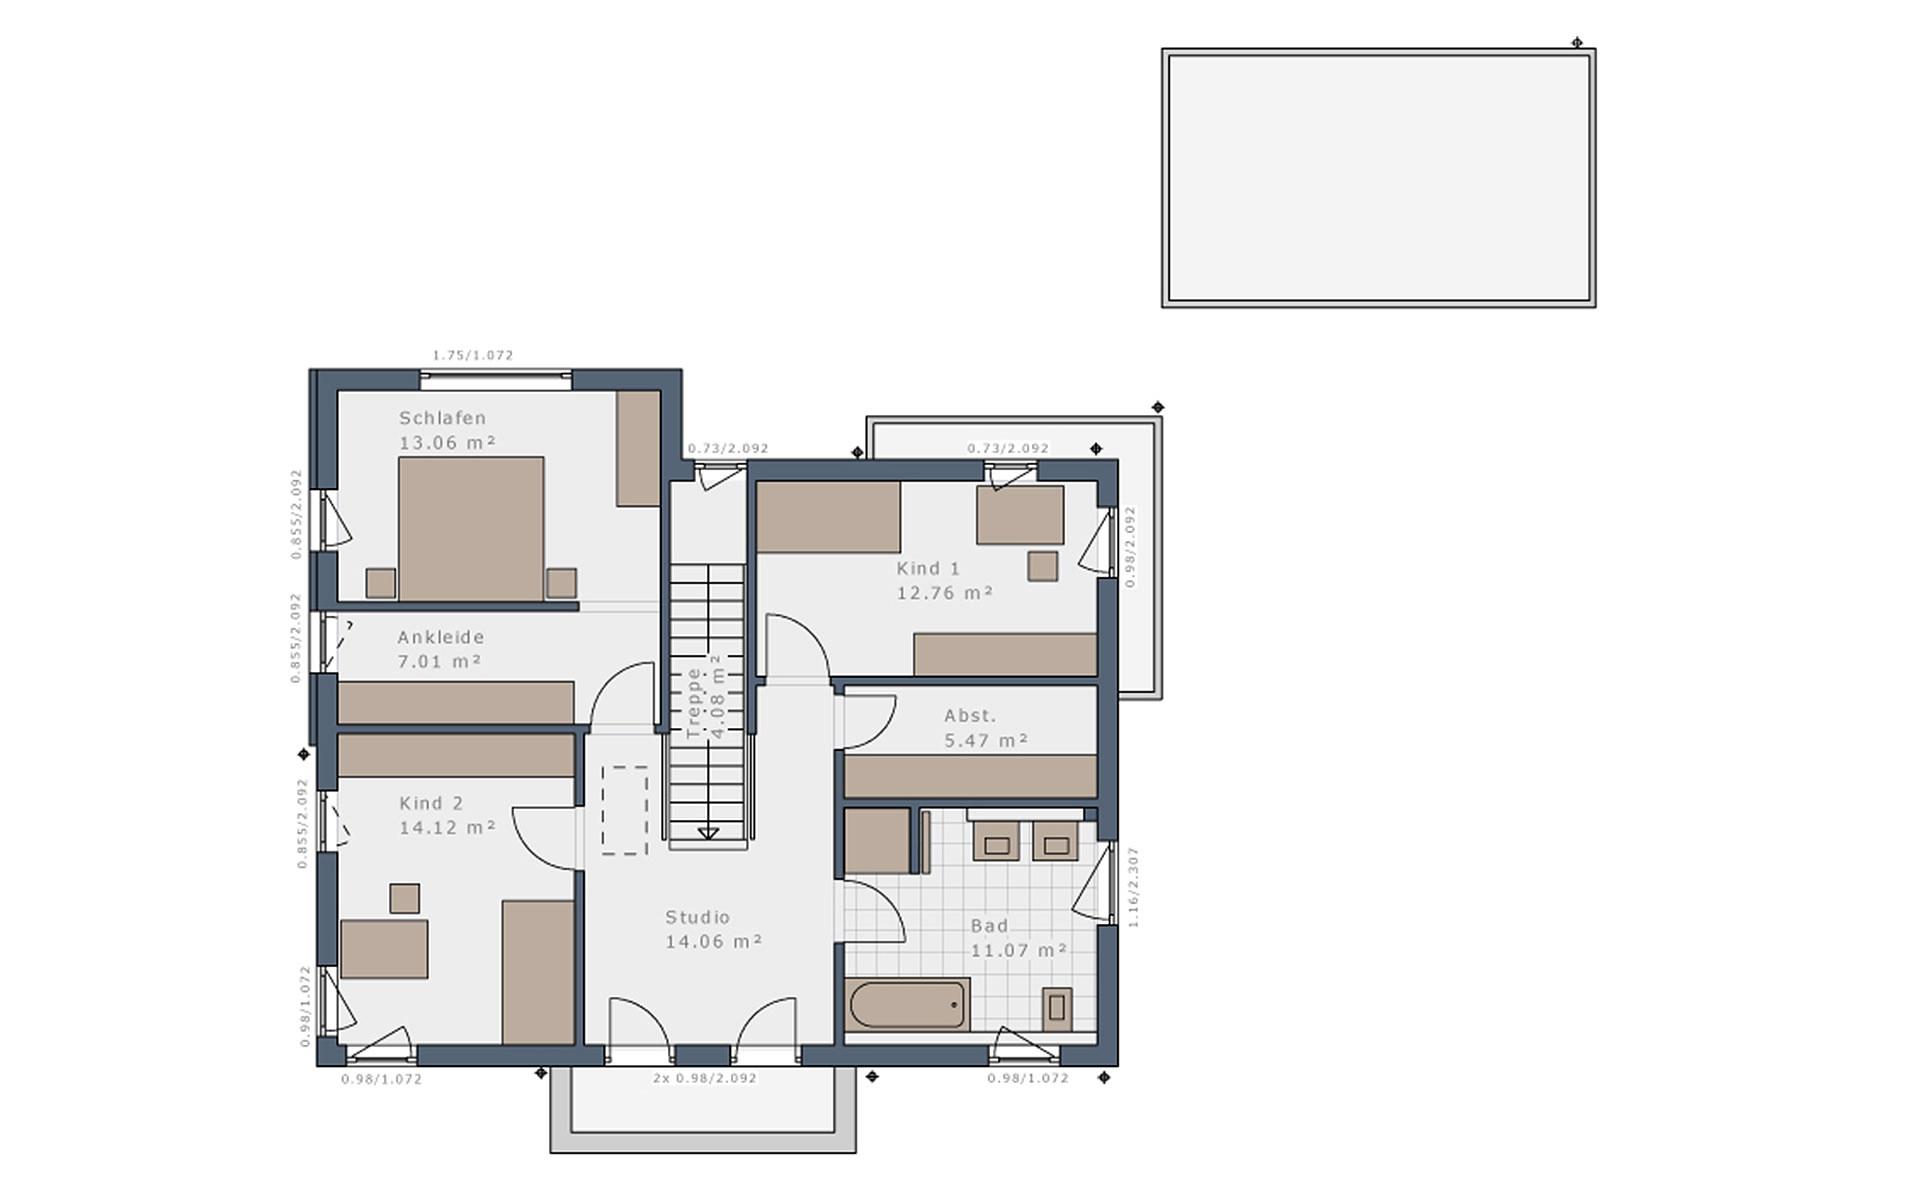 Obergeschoss Solitaire-E-155 E9 von Schwabenhaus GmbH & Co. KG